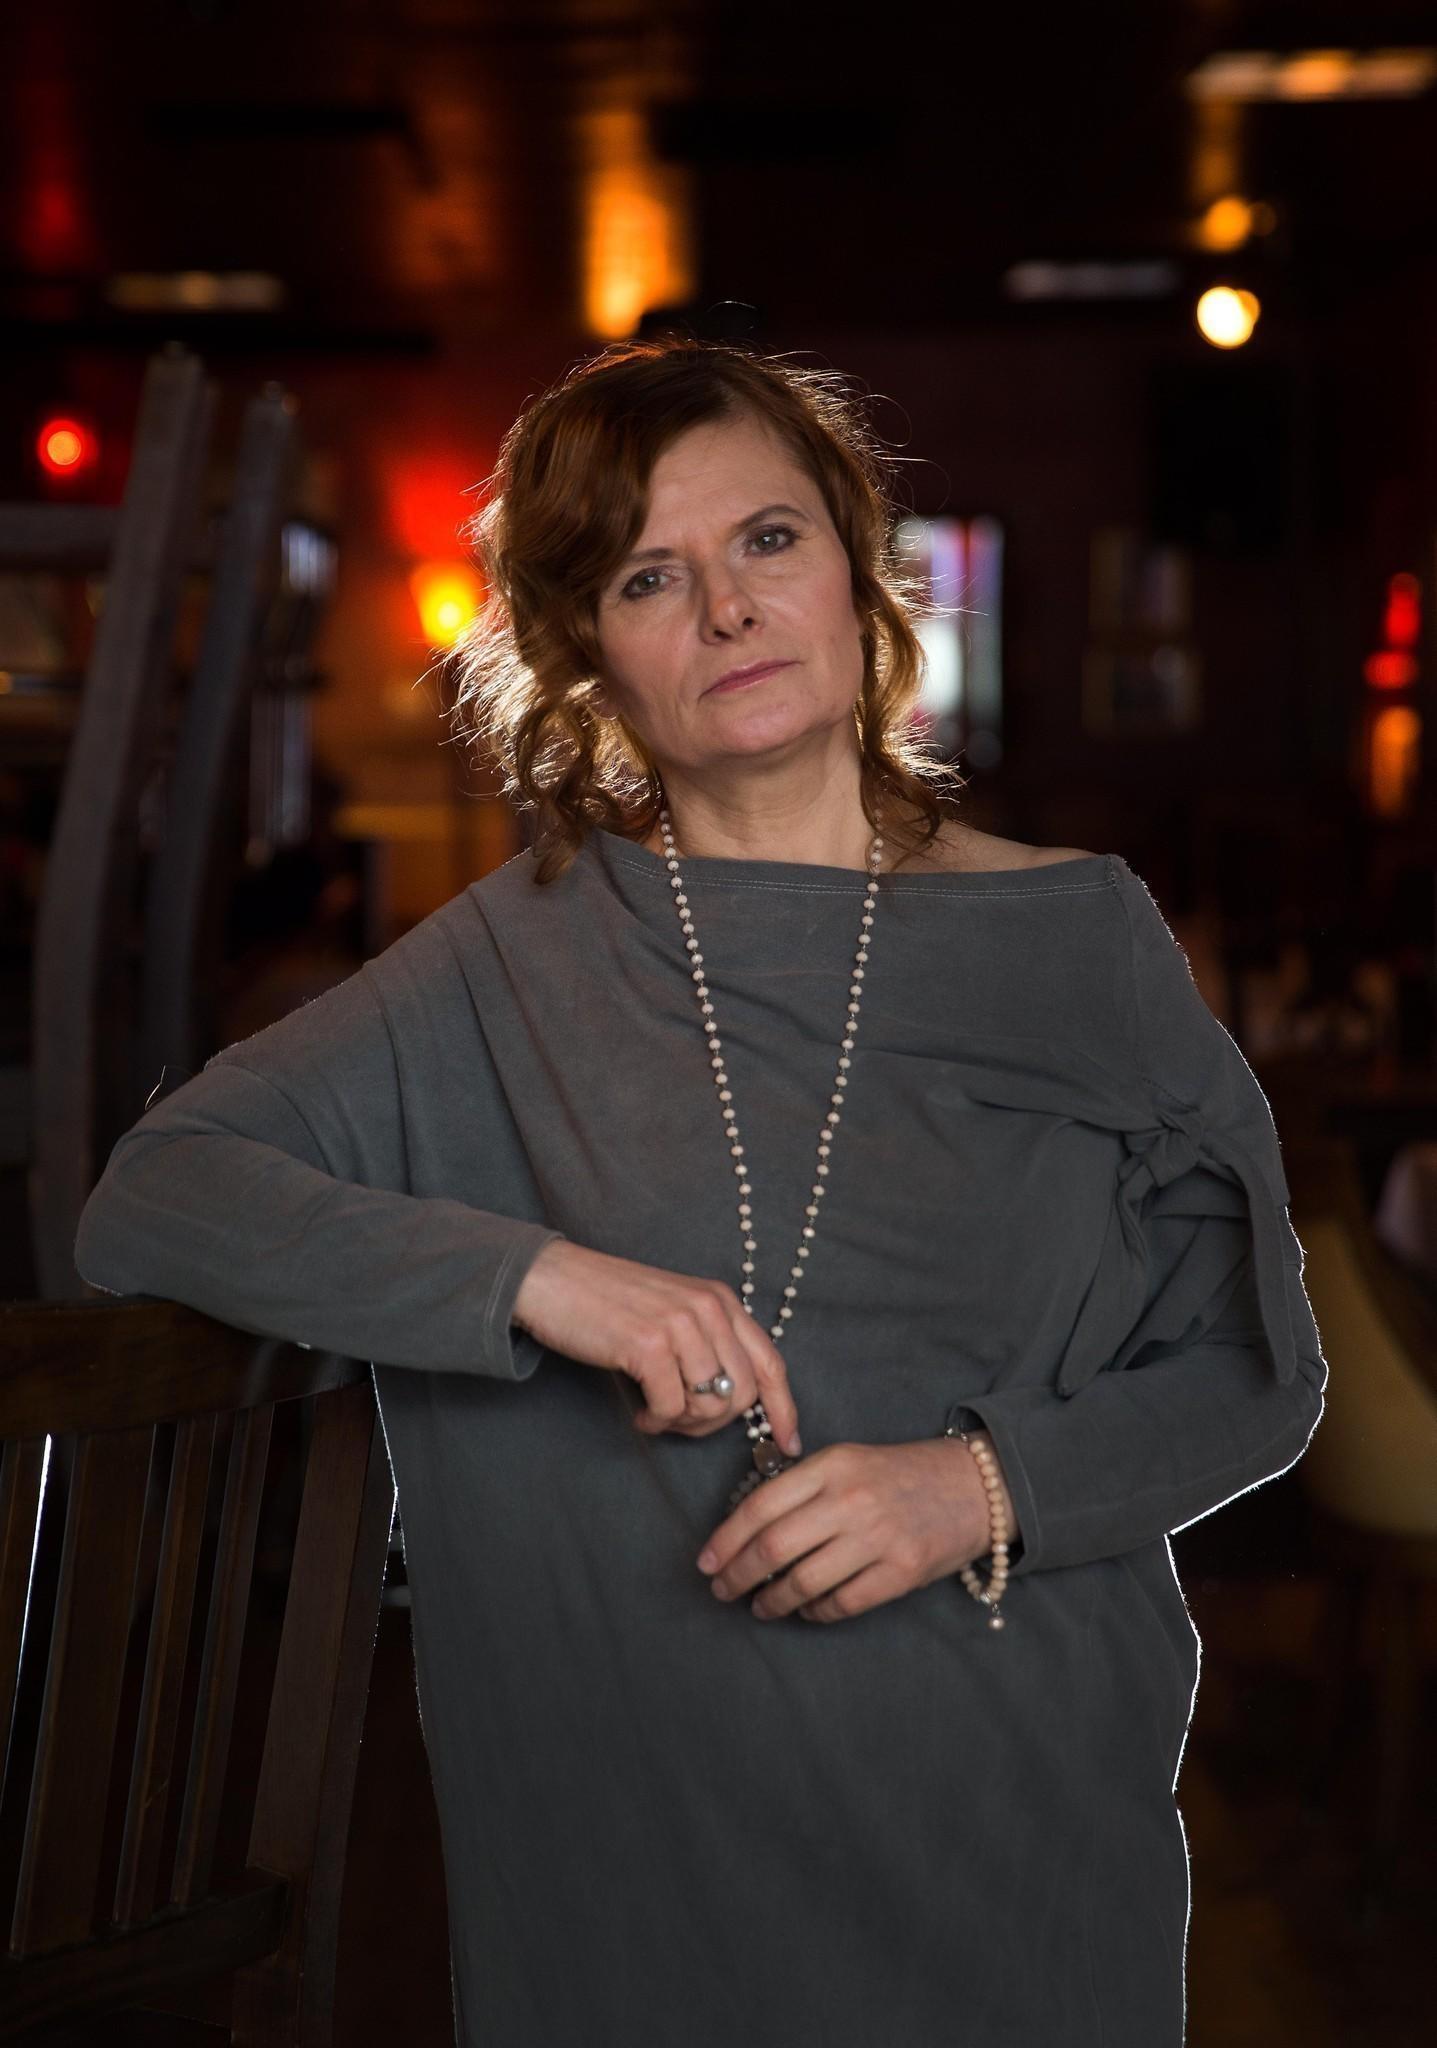 Jazz singer Grazyna Auguscik at Katerina's in Chicago.